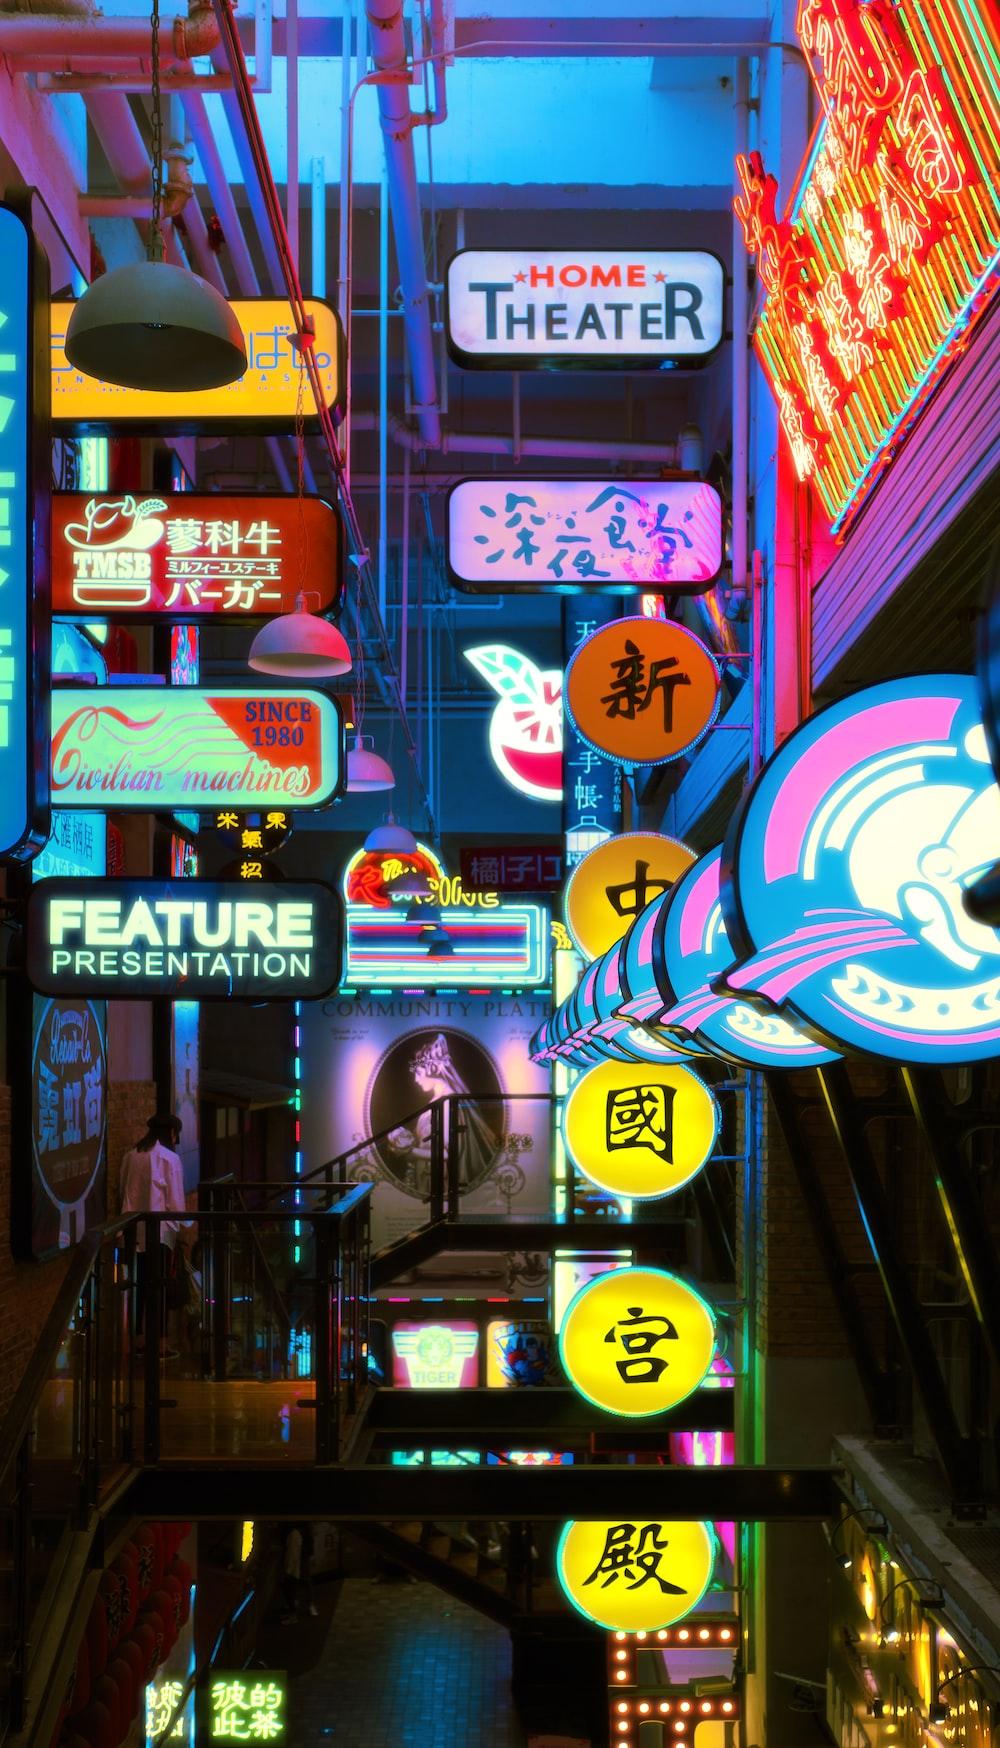 Neon Wallpapers Free HD Download [21+ HQ]   Unsplash